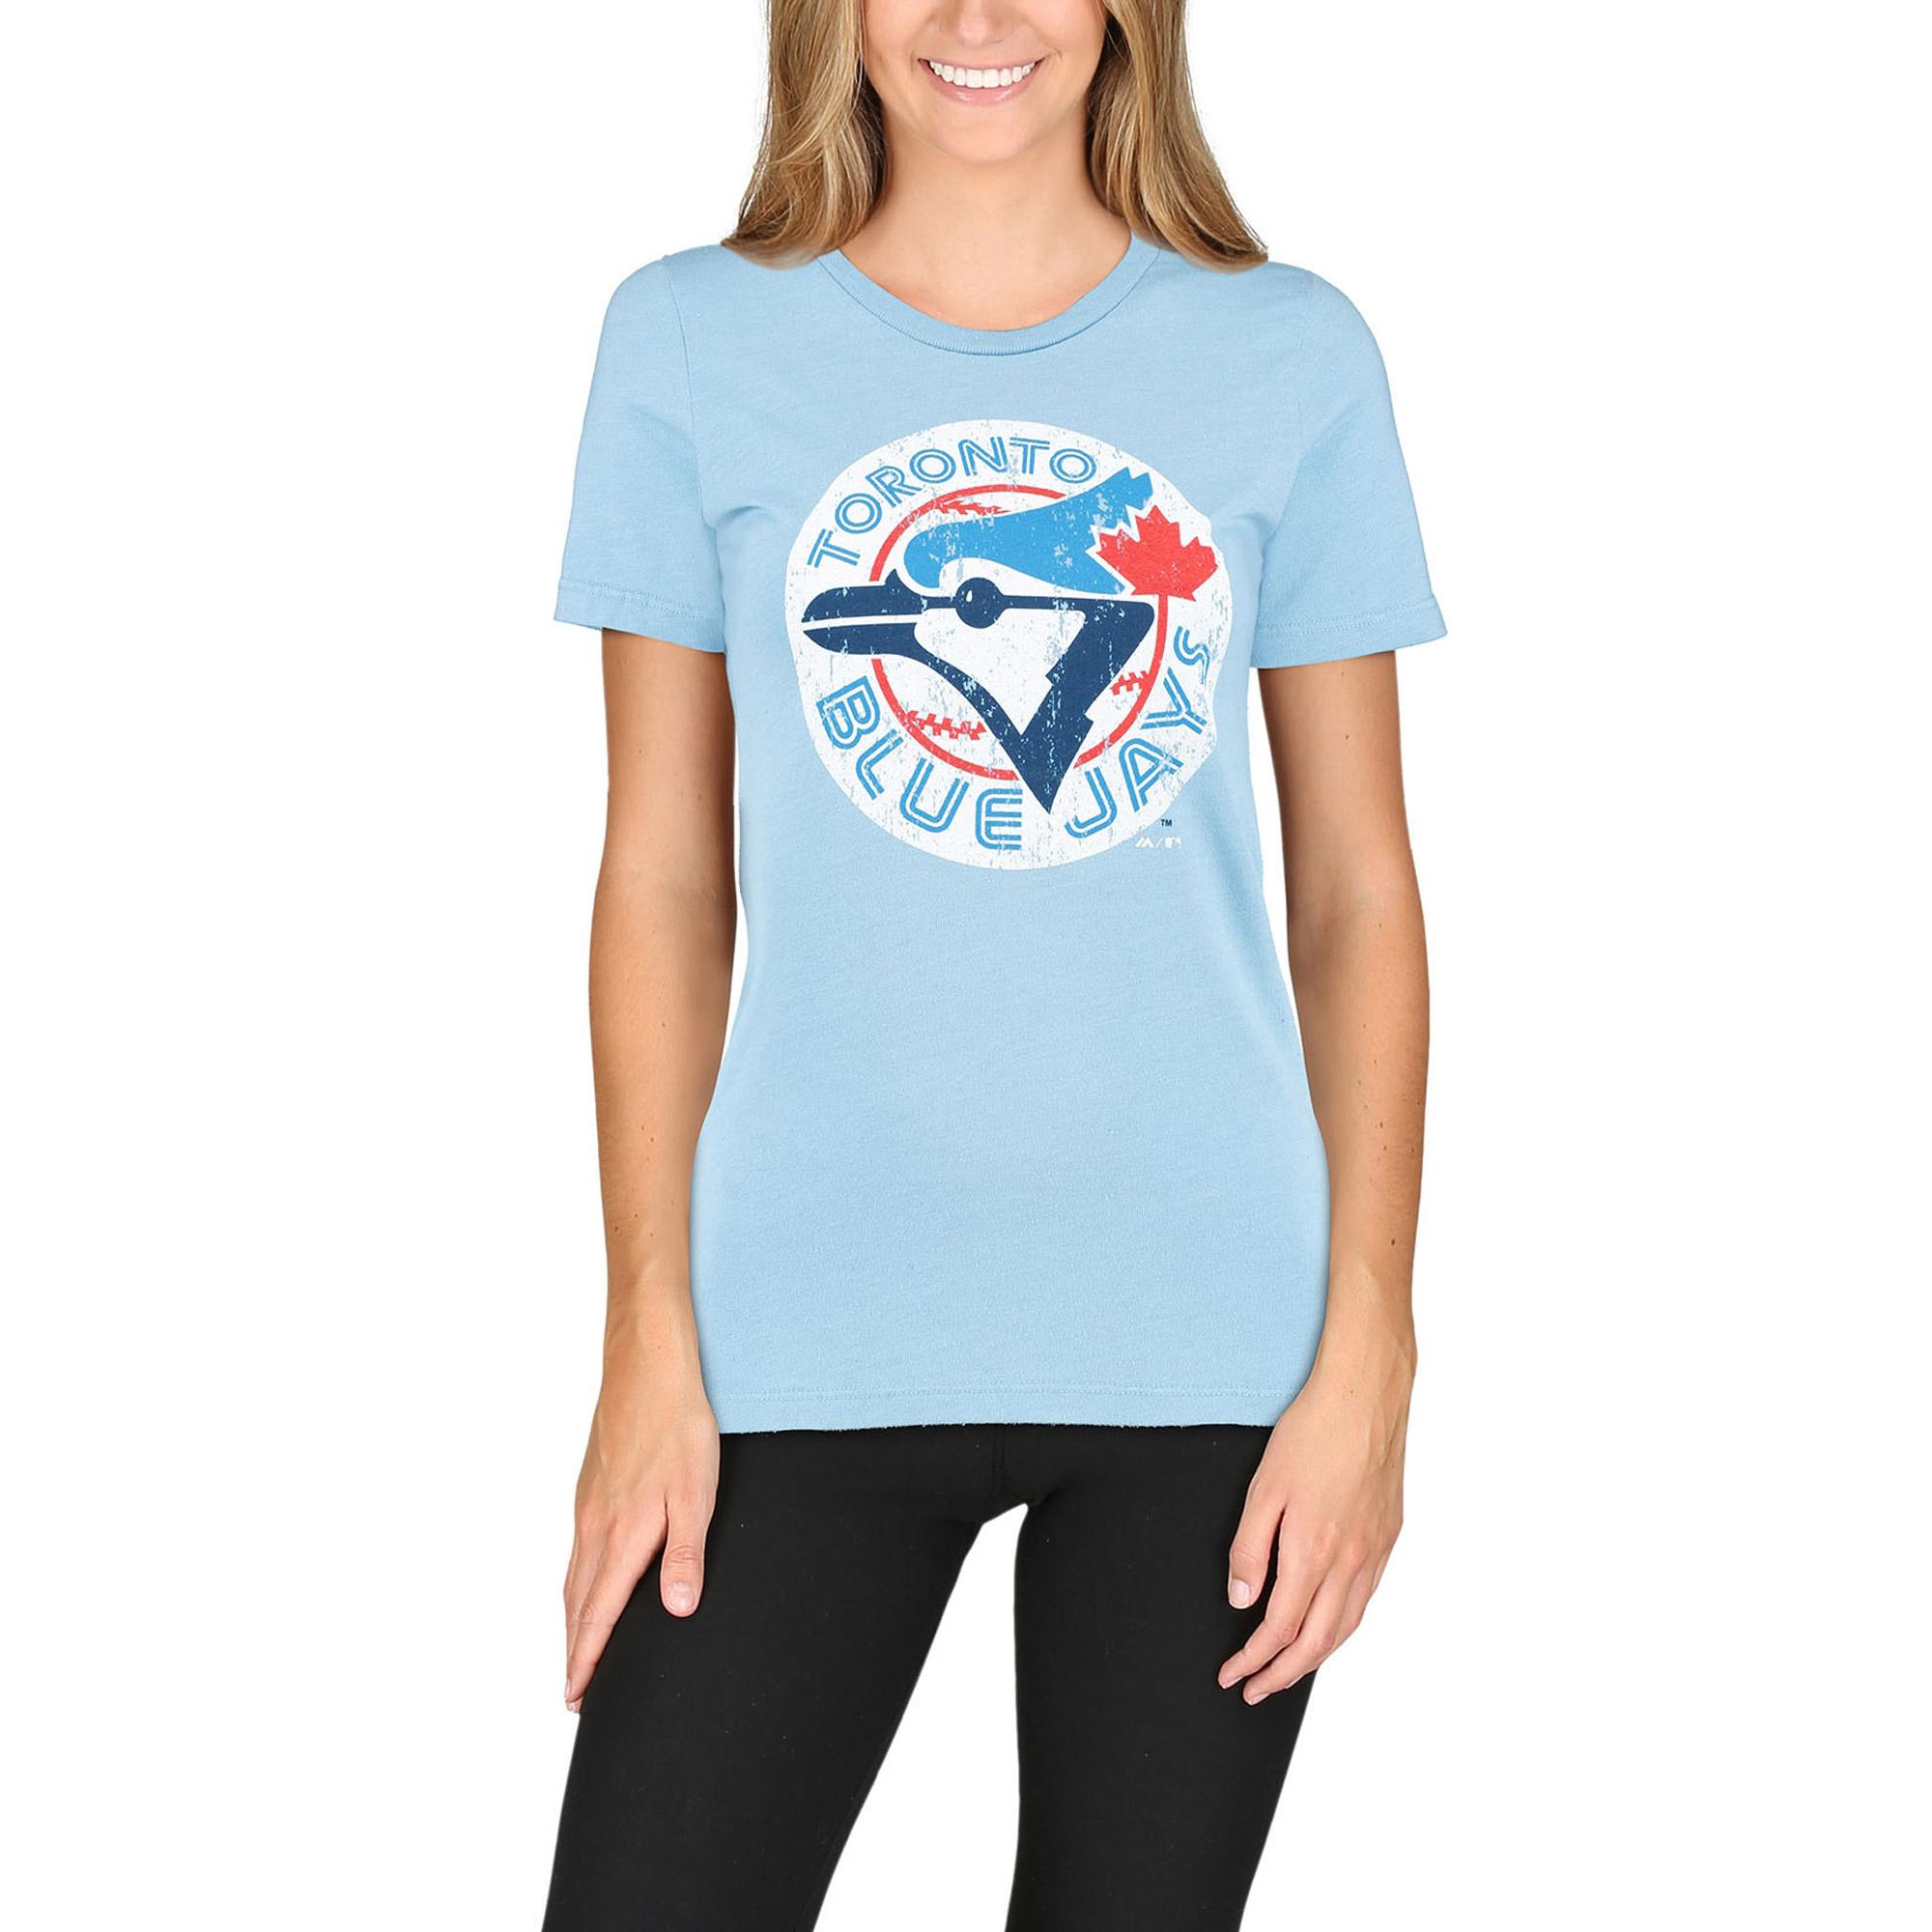 Toronto Blue Jays Majestic Threads Women's Cooperstown Tee - Light Blue